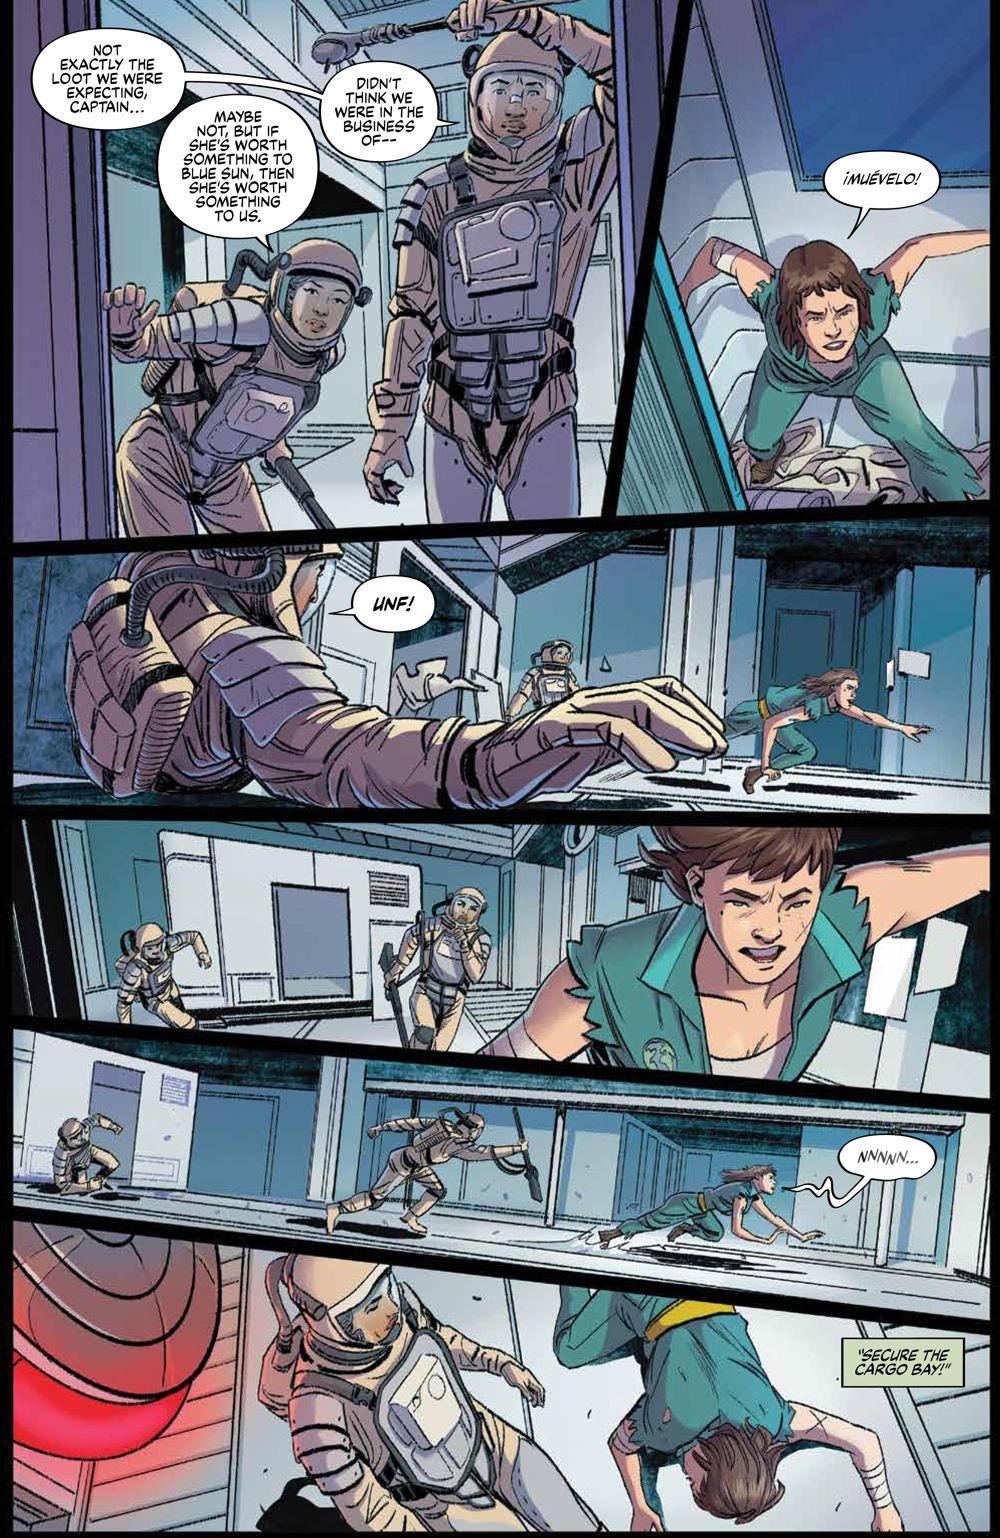 Firefly_BrandNewVerse_002_PRESS_3 ComicList Previews: FIREFLY A BRAND NEW 'VERSE #2 (OF 6)